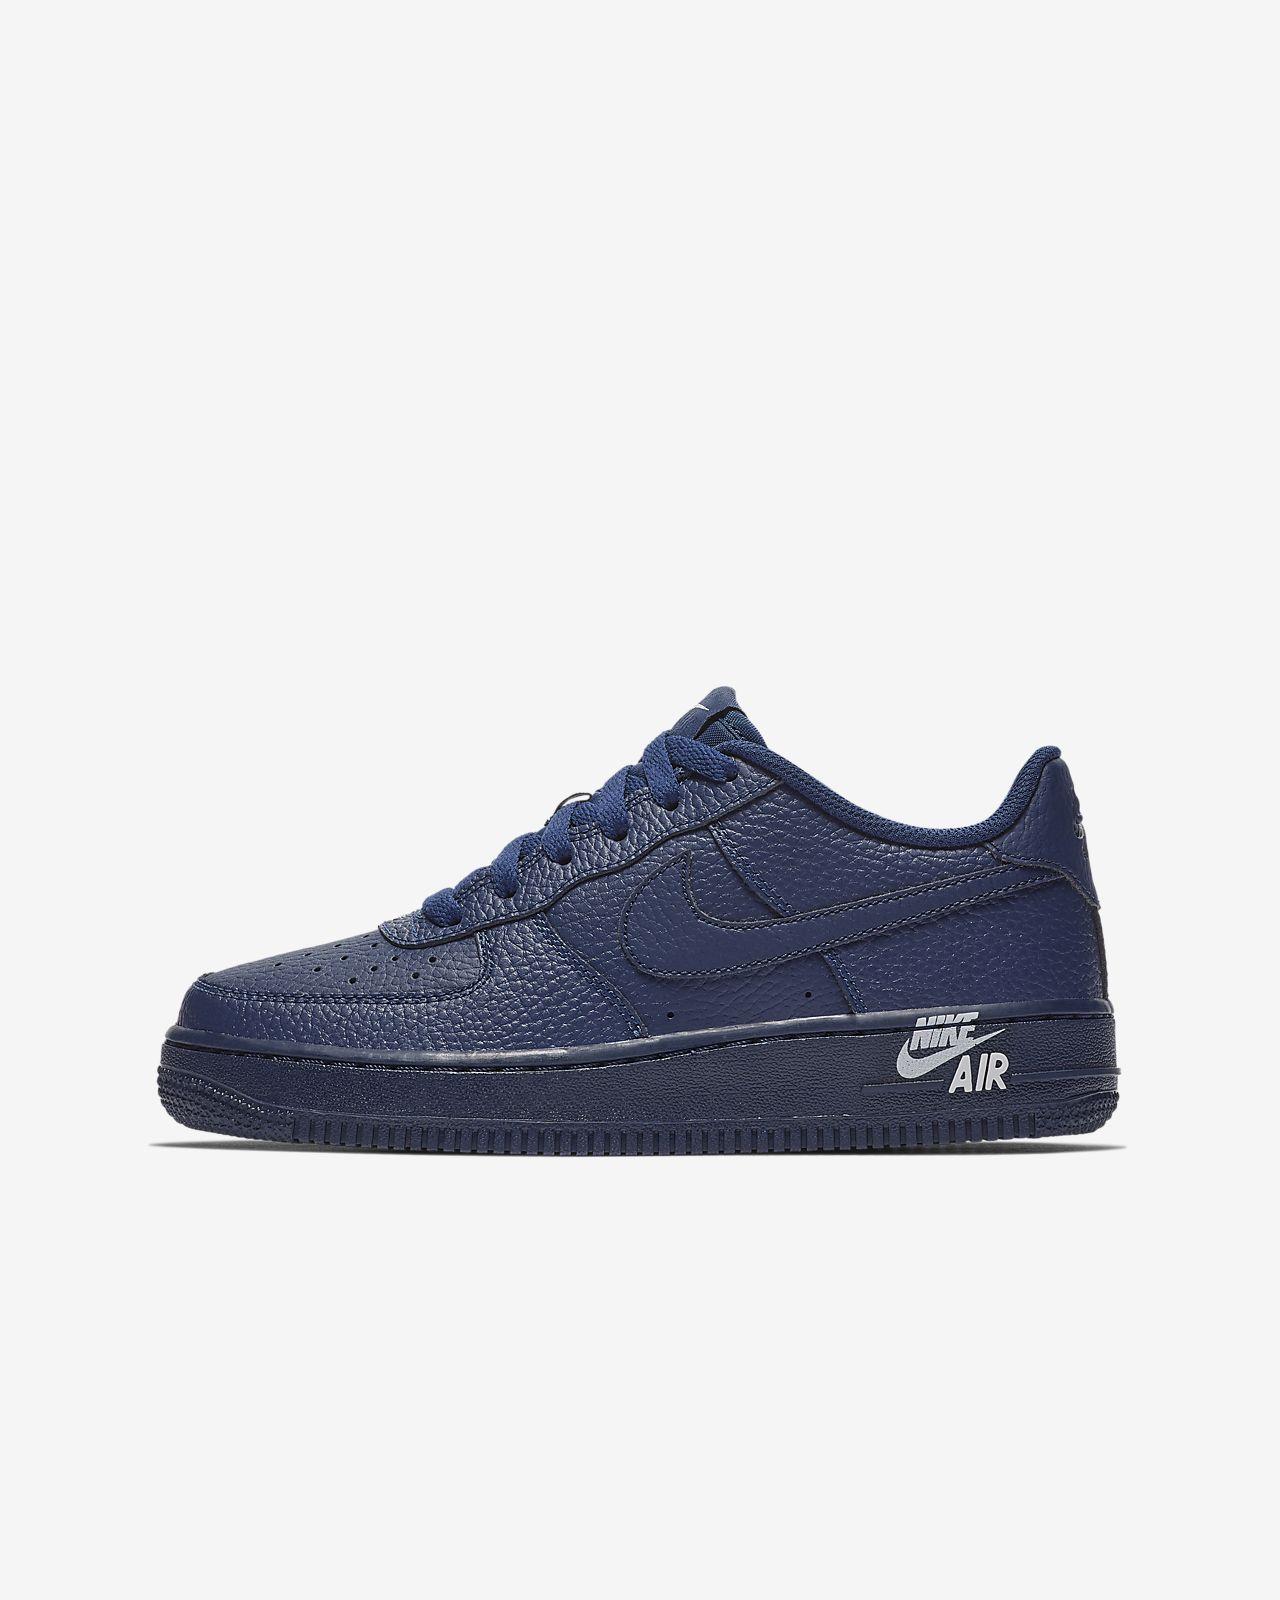 Calzado para niños talla grande Nike Air Force 1